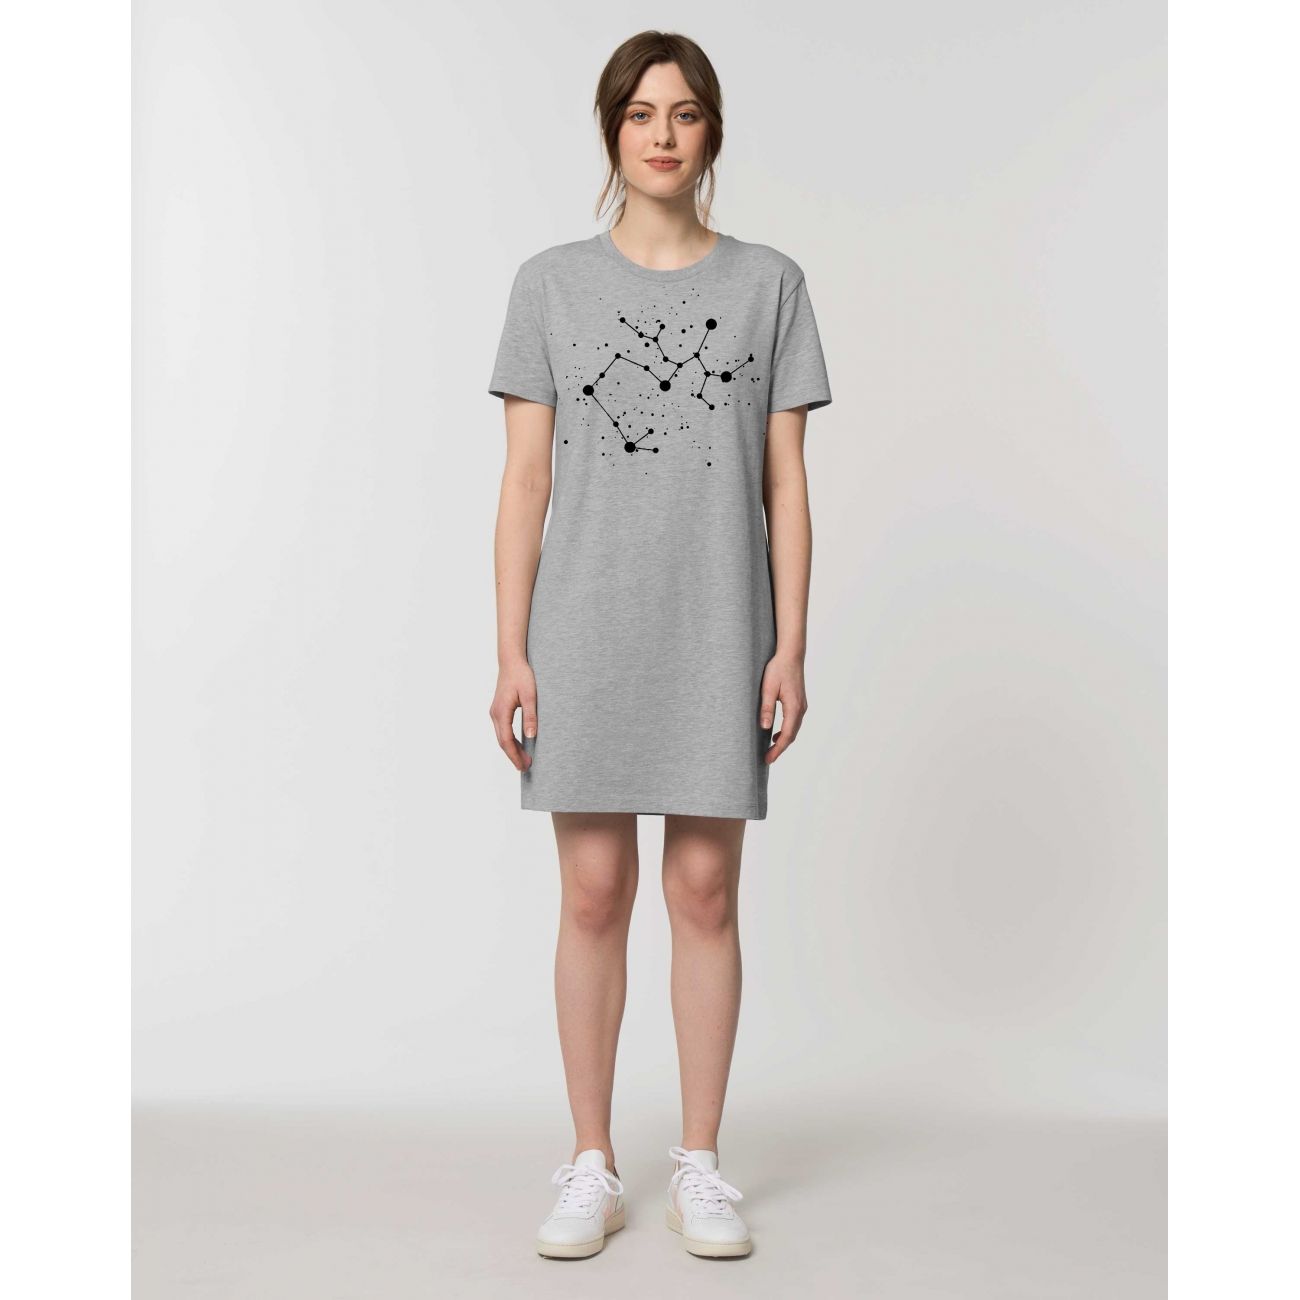 https://tee-shirt-bio.com/9542-thickbox_default/robe-tee-shirt-coton-bio-gris-chine-impression-constellation.jpg